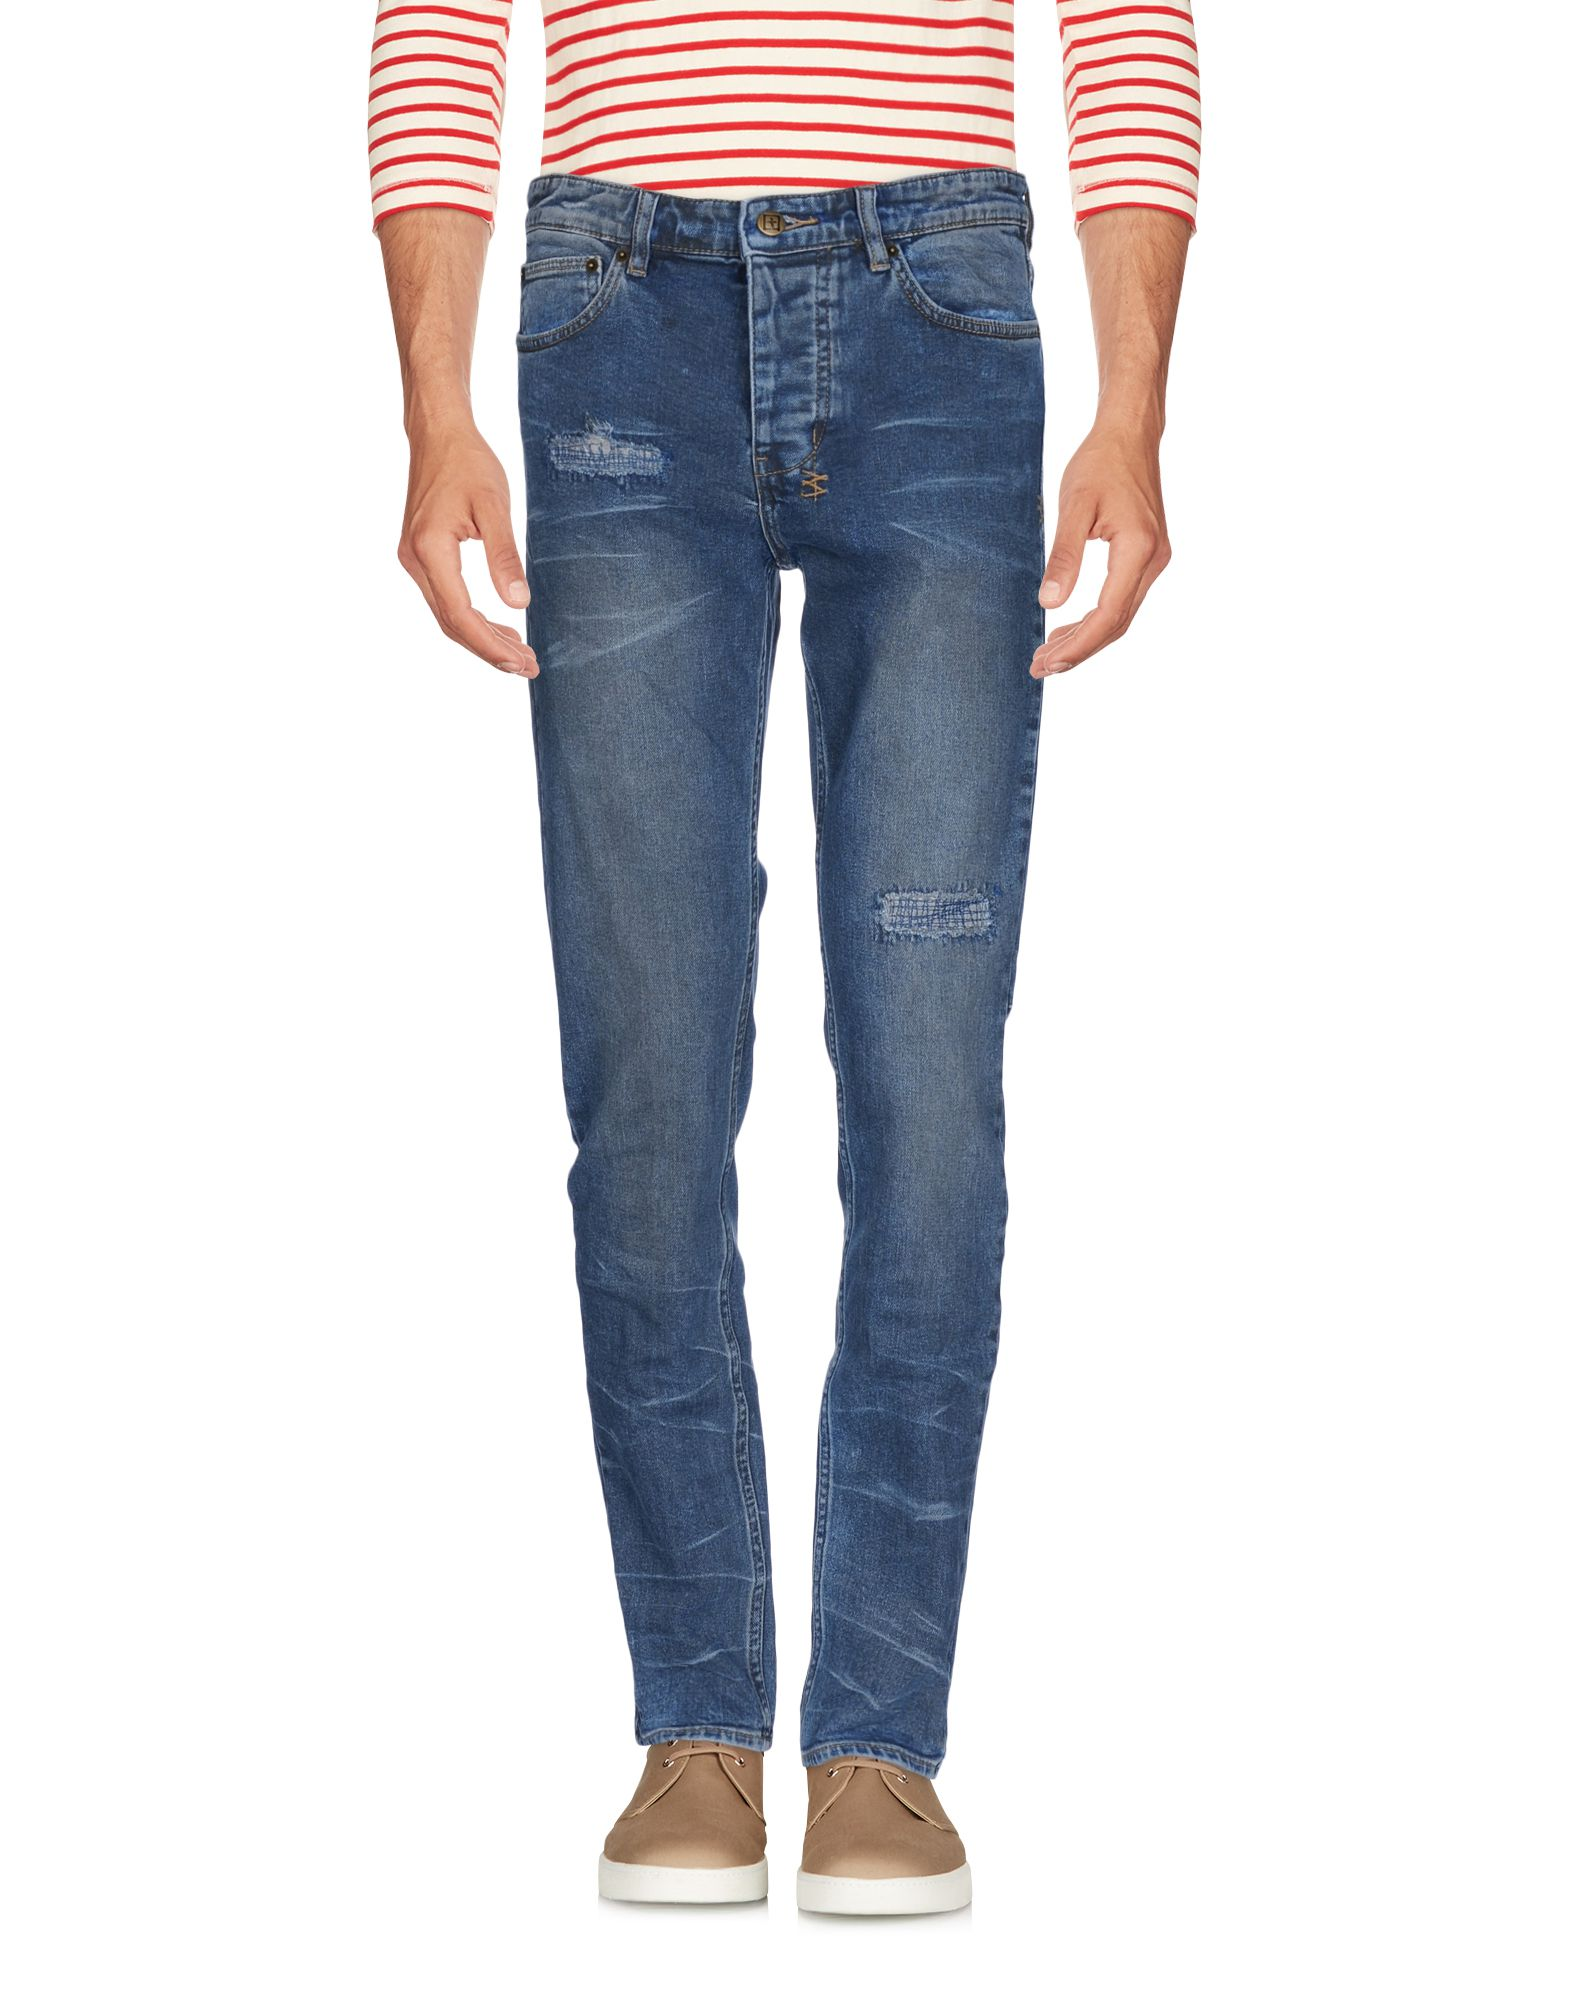 Pantaloni Jeans Ksubi Uomo - Acquista online su